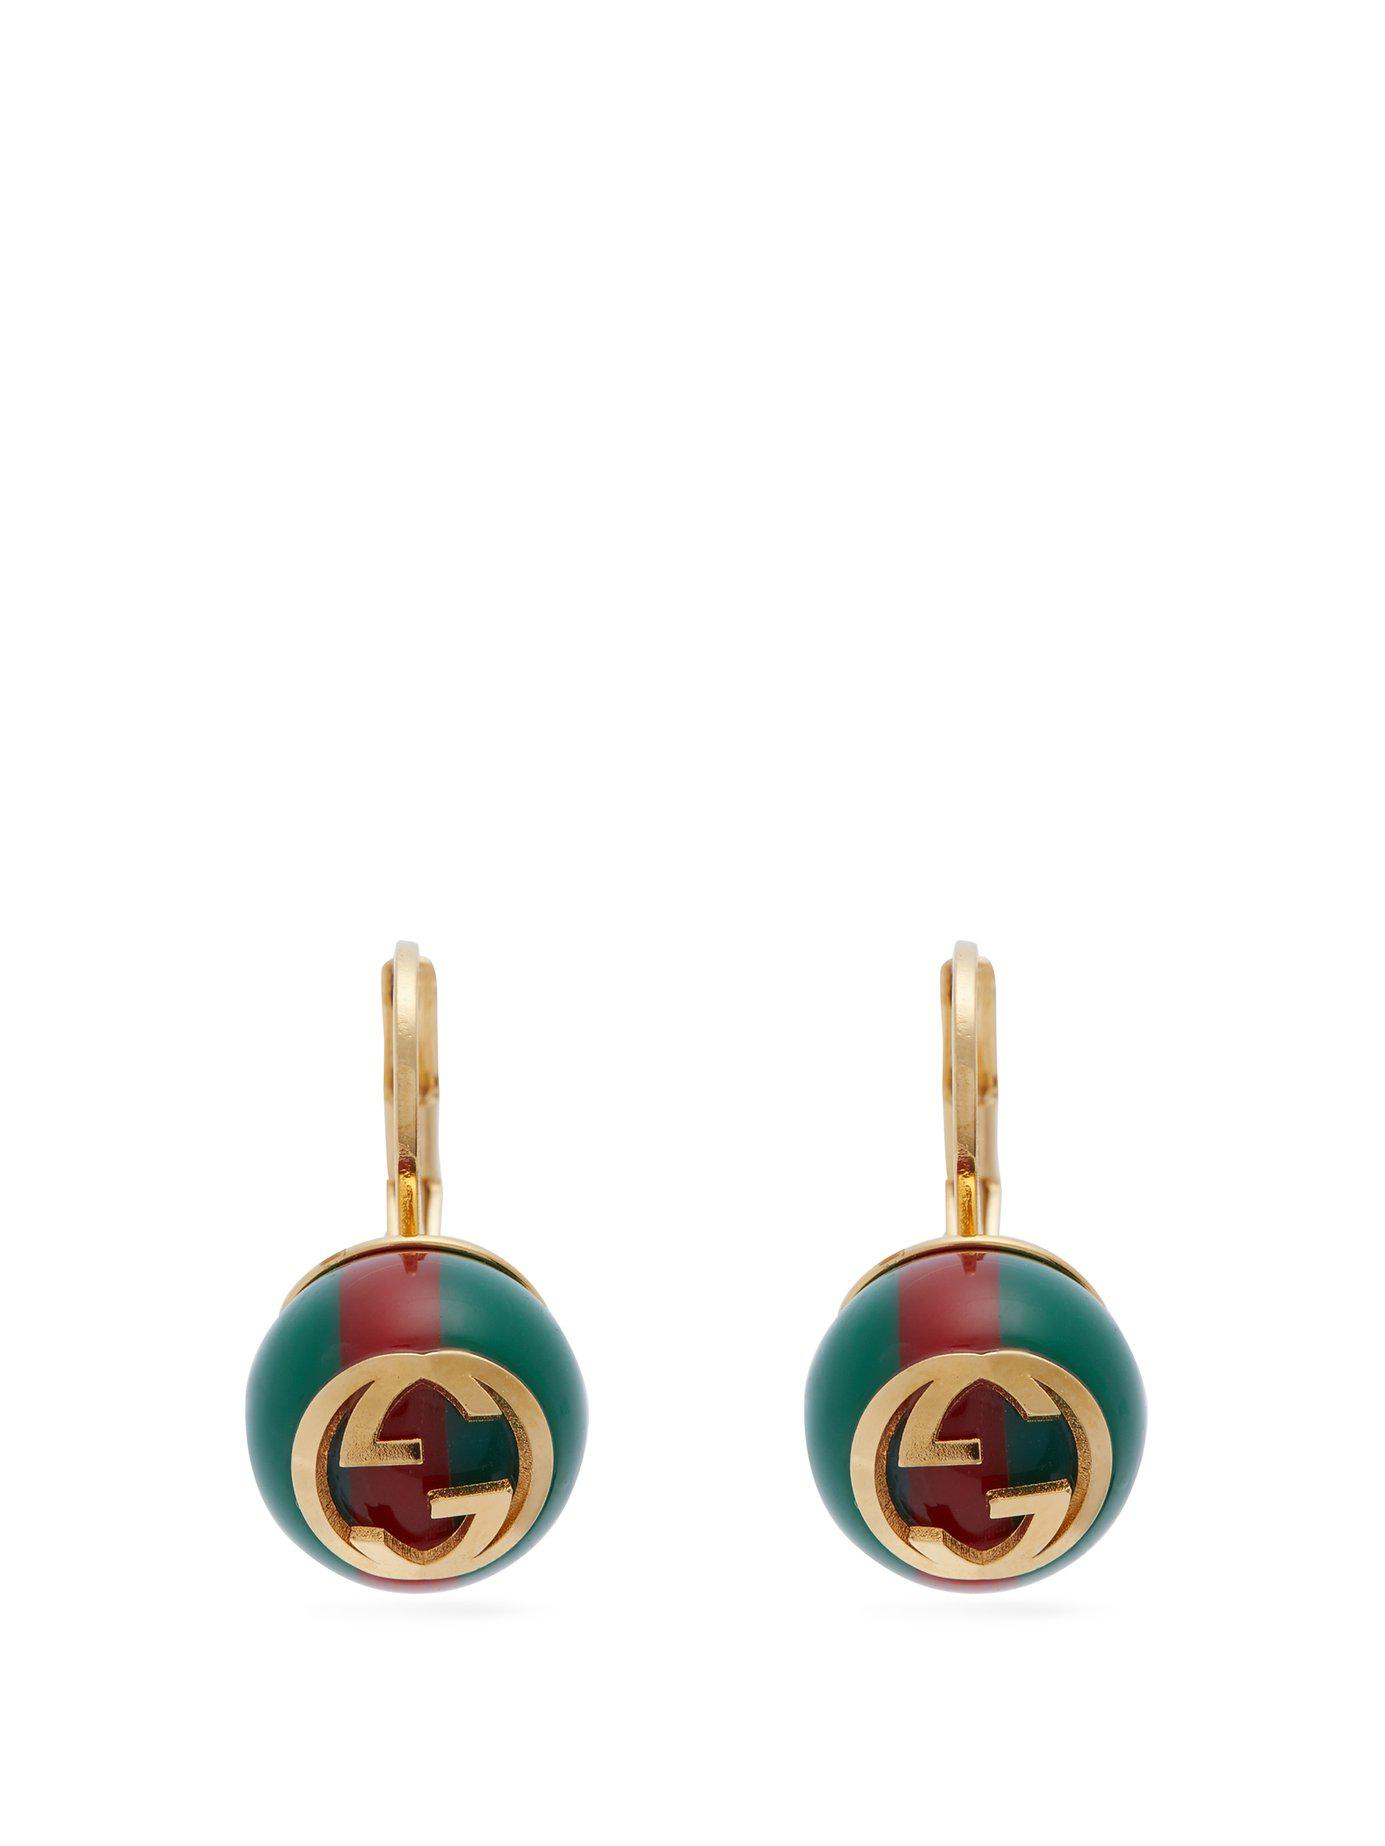 c0a36d8b2d5 Lyst - Gucci Gg Web Stripe Earrings in Green - Save 69%